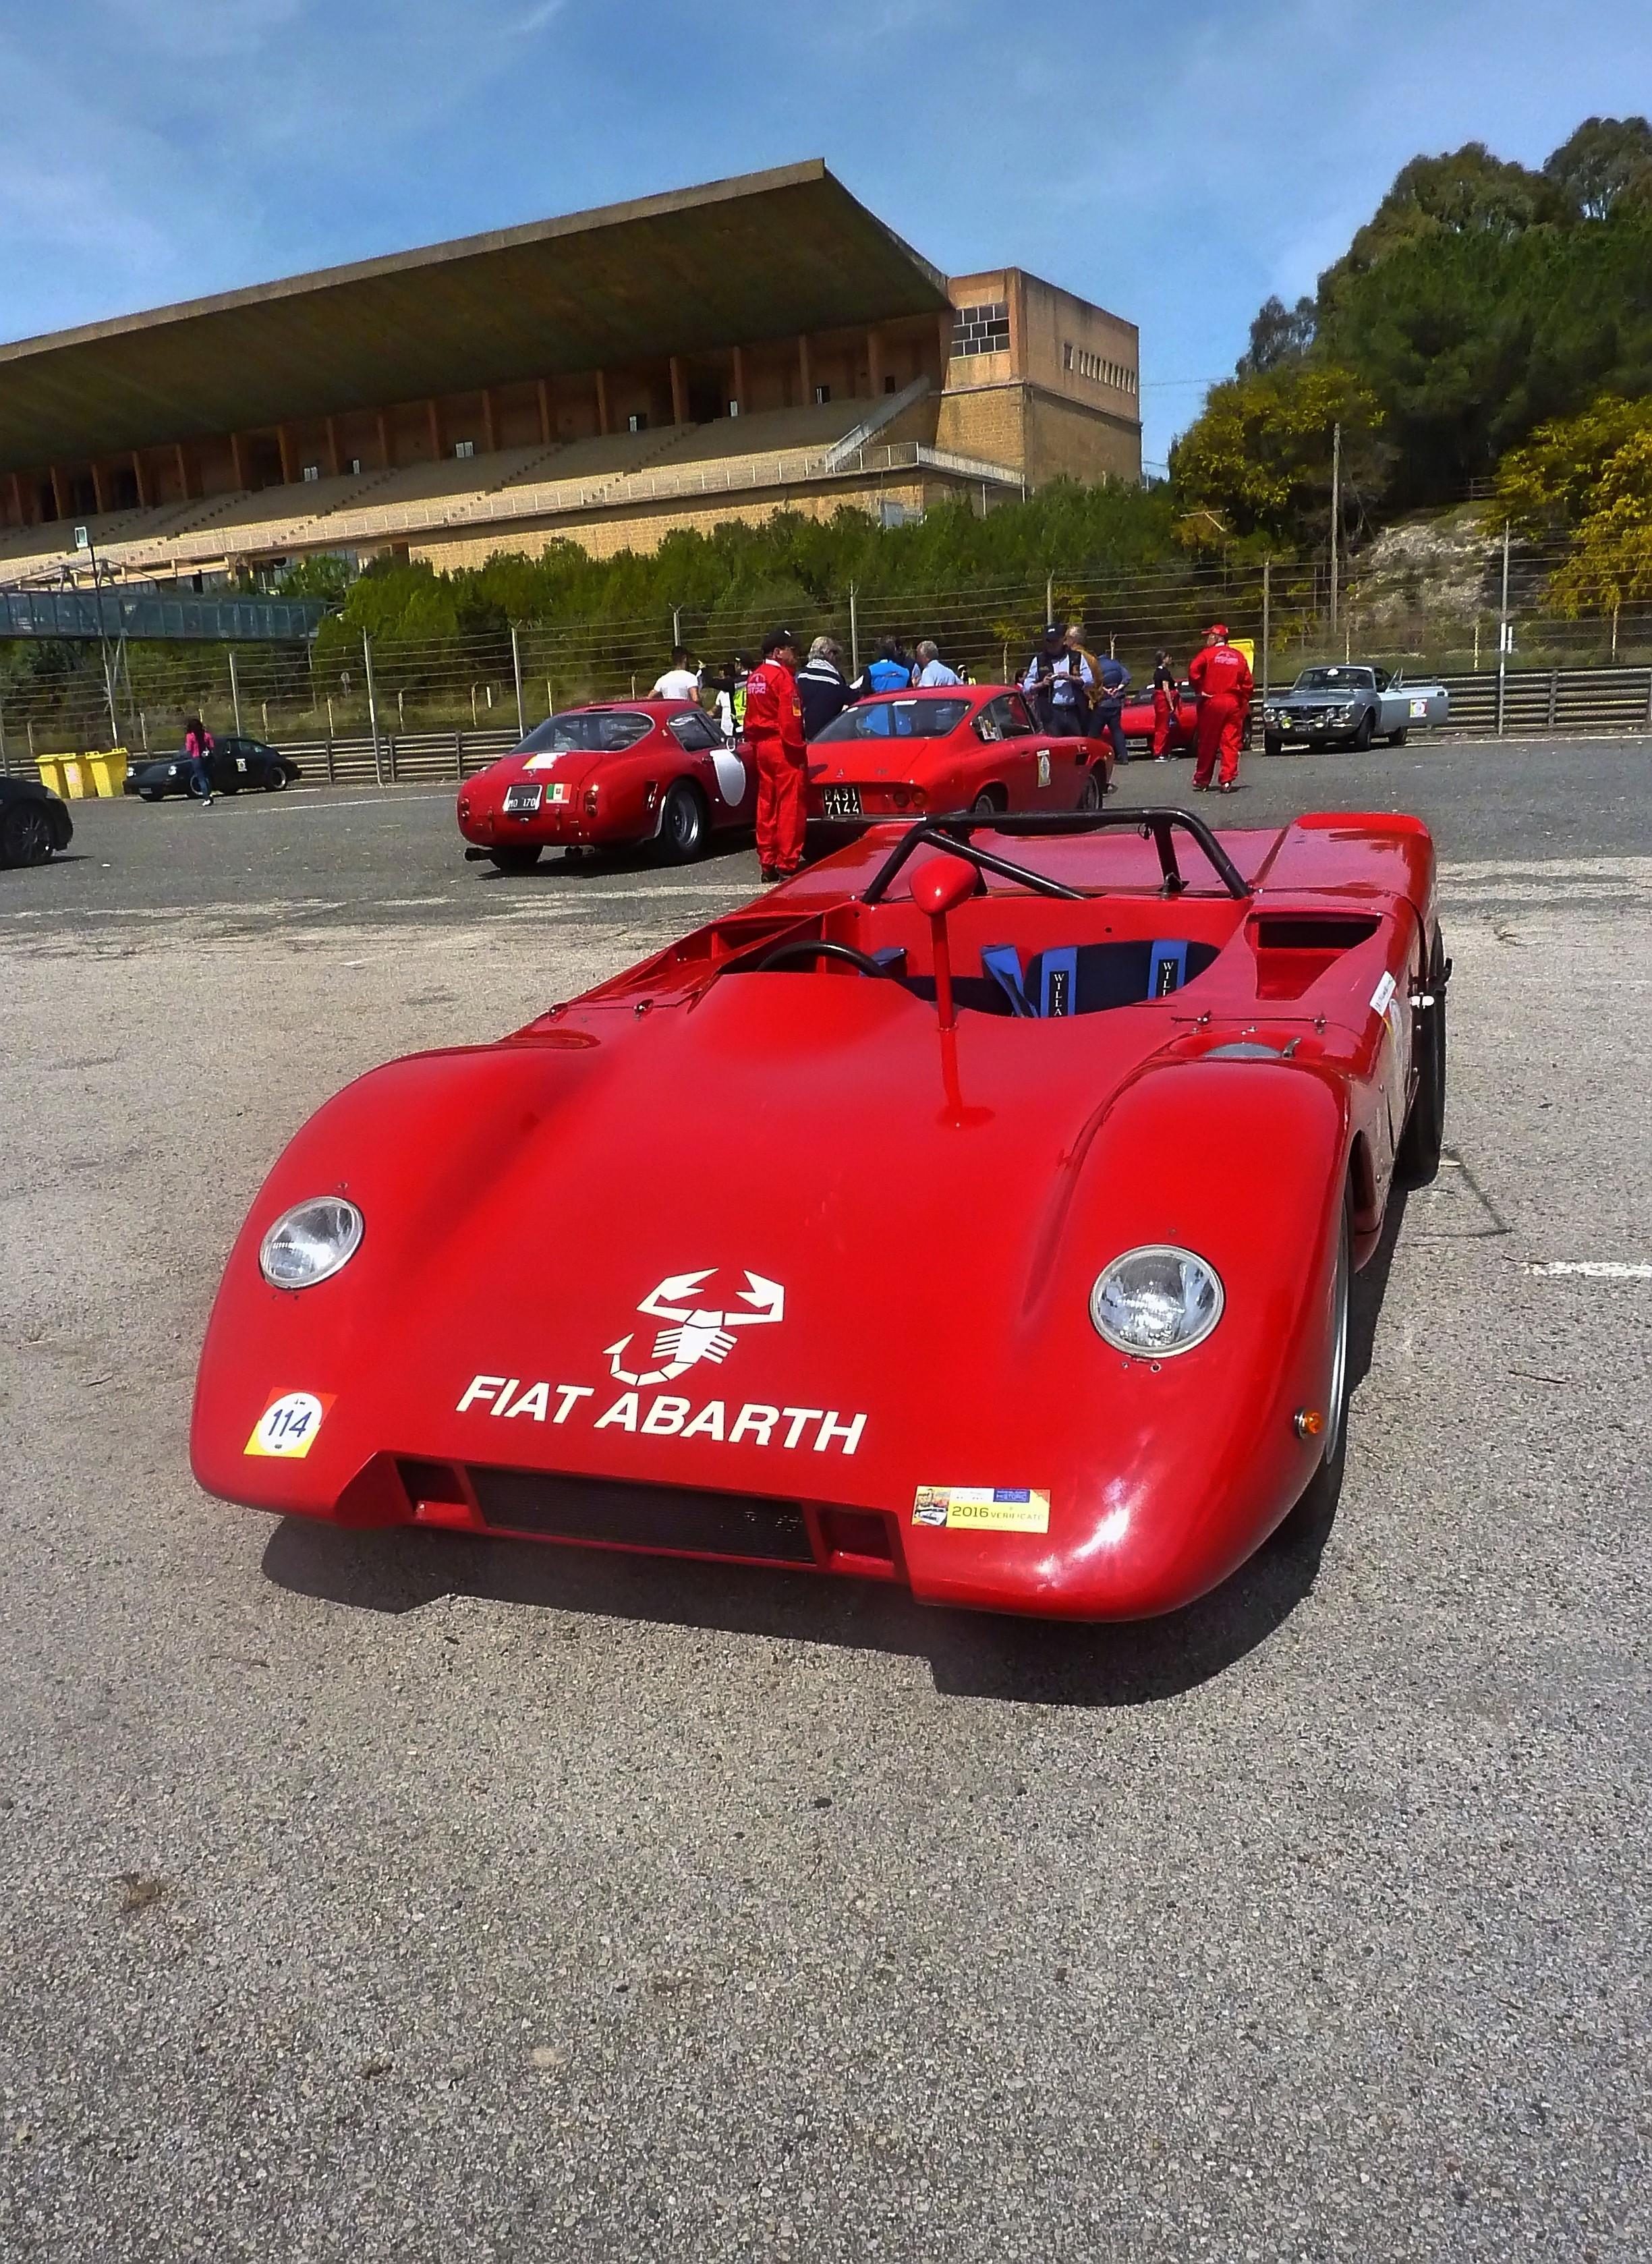 1971 Abarth 1300 SE 018 Biposto Cuneo (14)